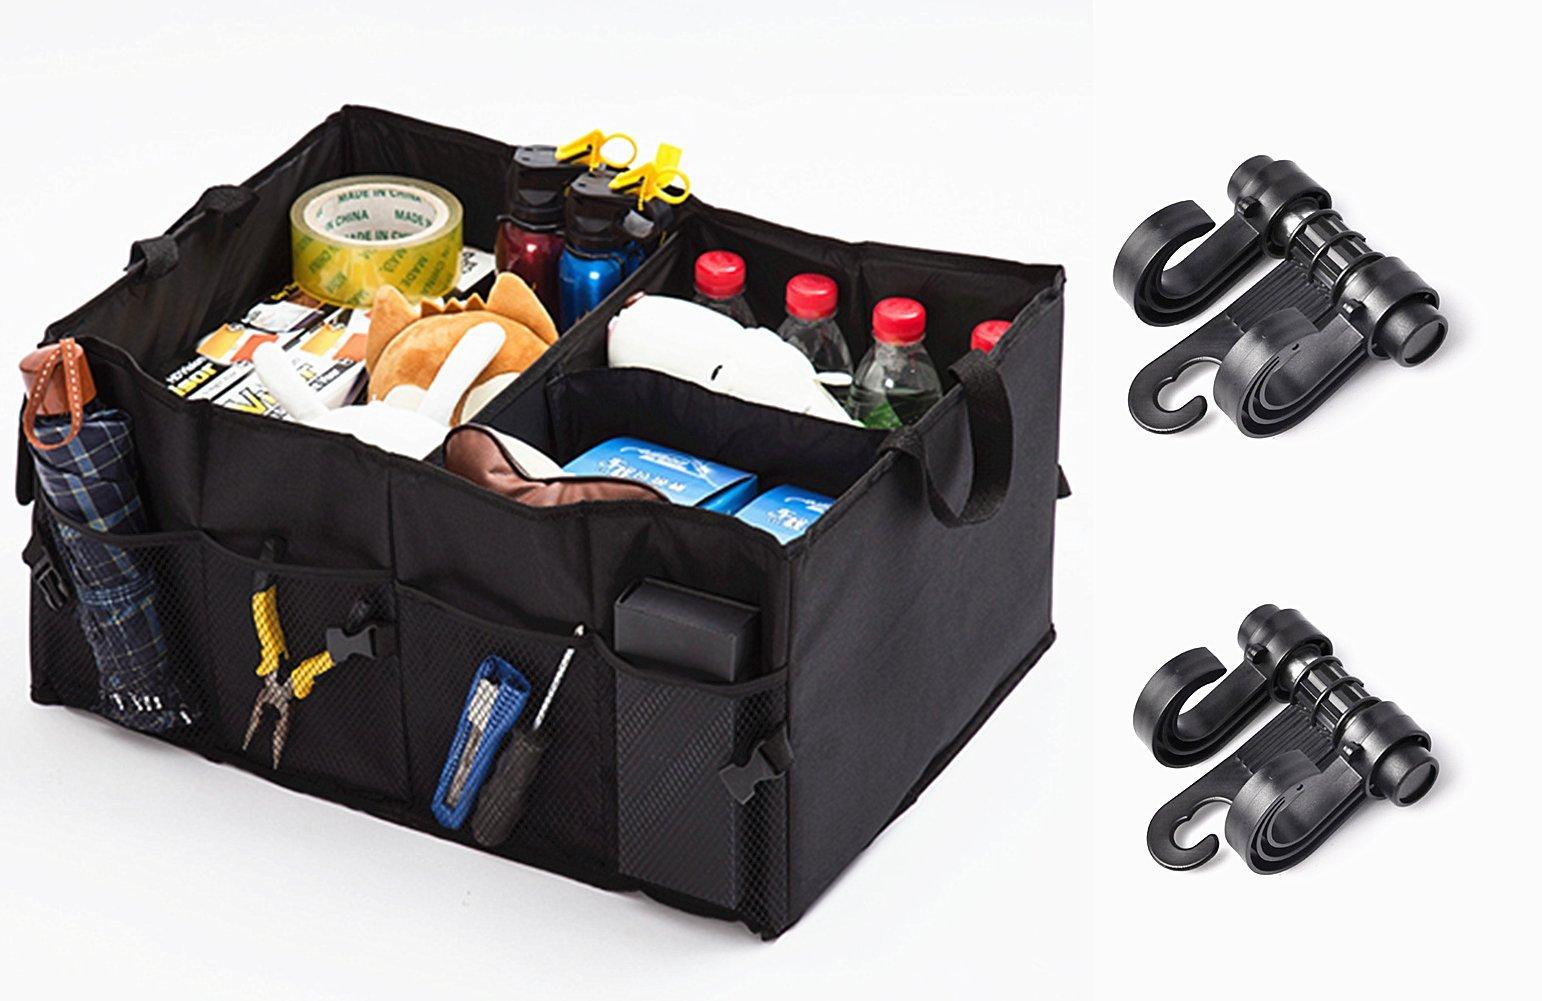 PiXiu-XP 1Car Trunk Organizer-2 Pack Seat Headrest Hook(black) Kids Accessories Backseat Organizer